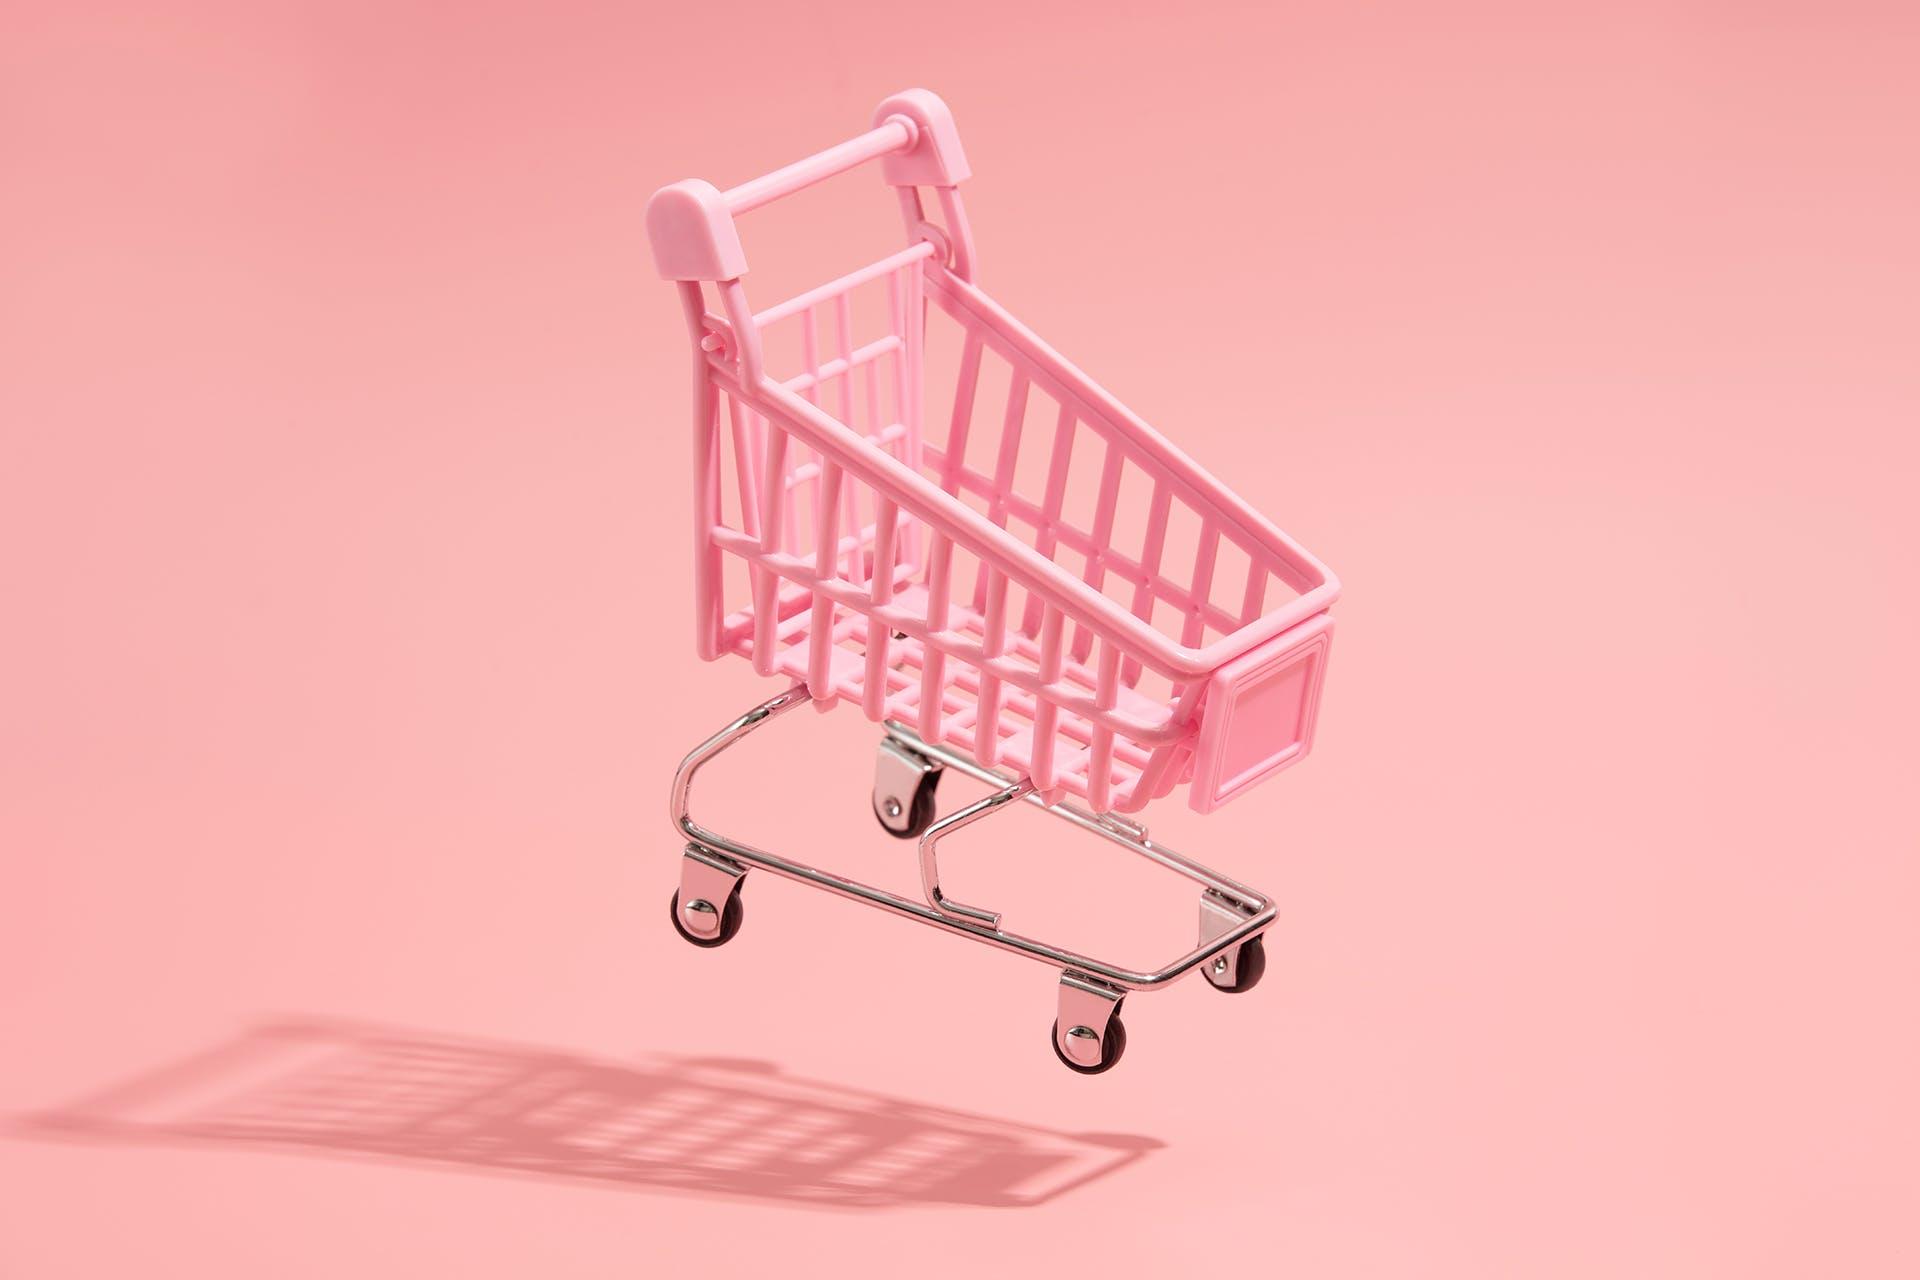 Pink miniature grocery cart on light pink background. Blog post on transactional marketing vs relationship marketing